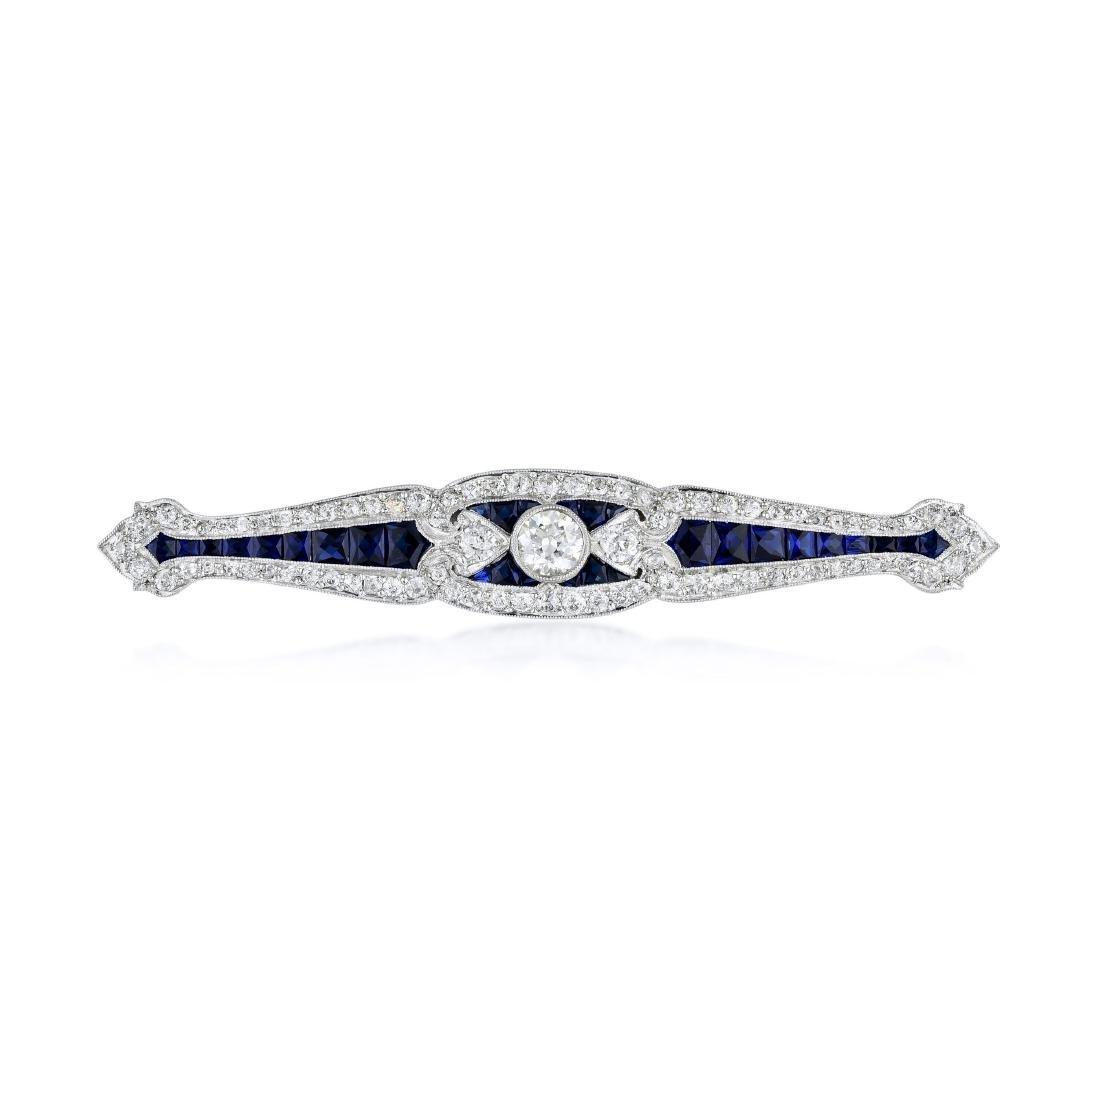 Art Deco Platinum Diamond and Synthetic Sapphire Pin